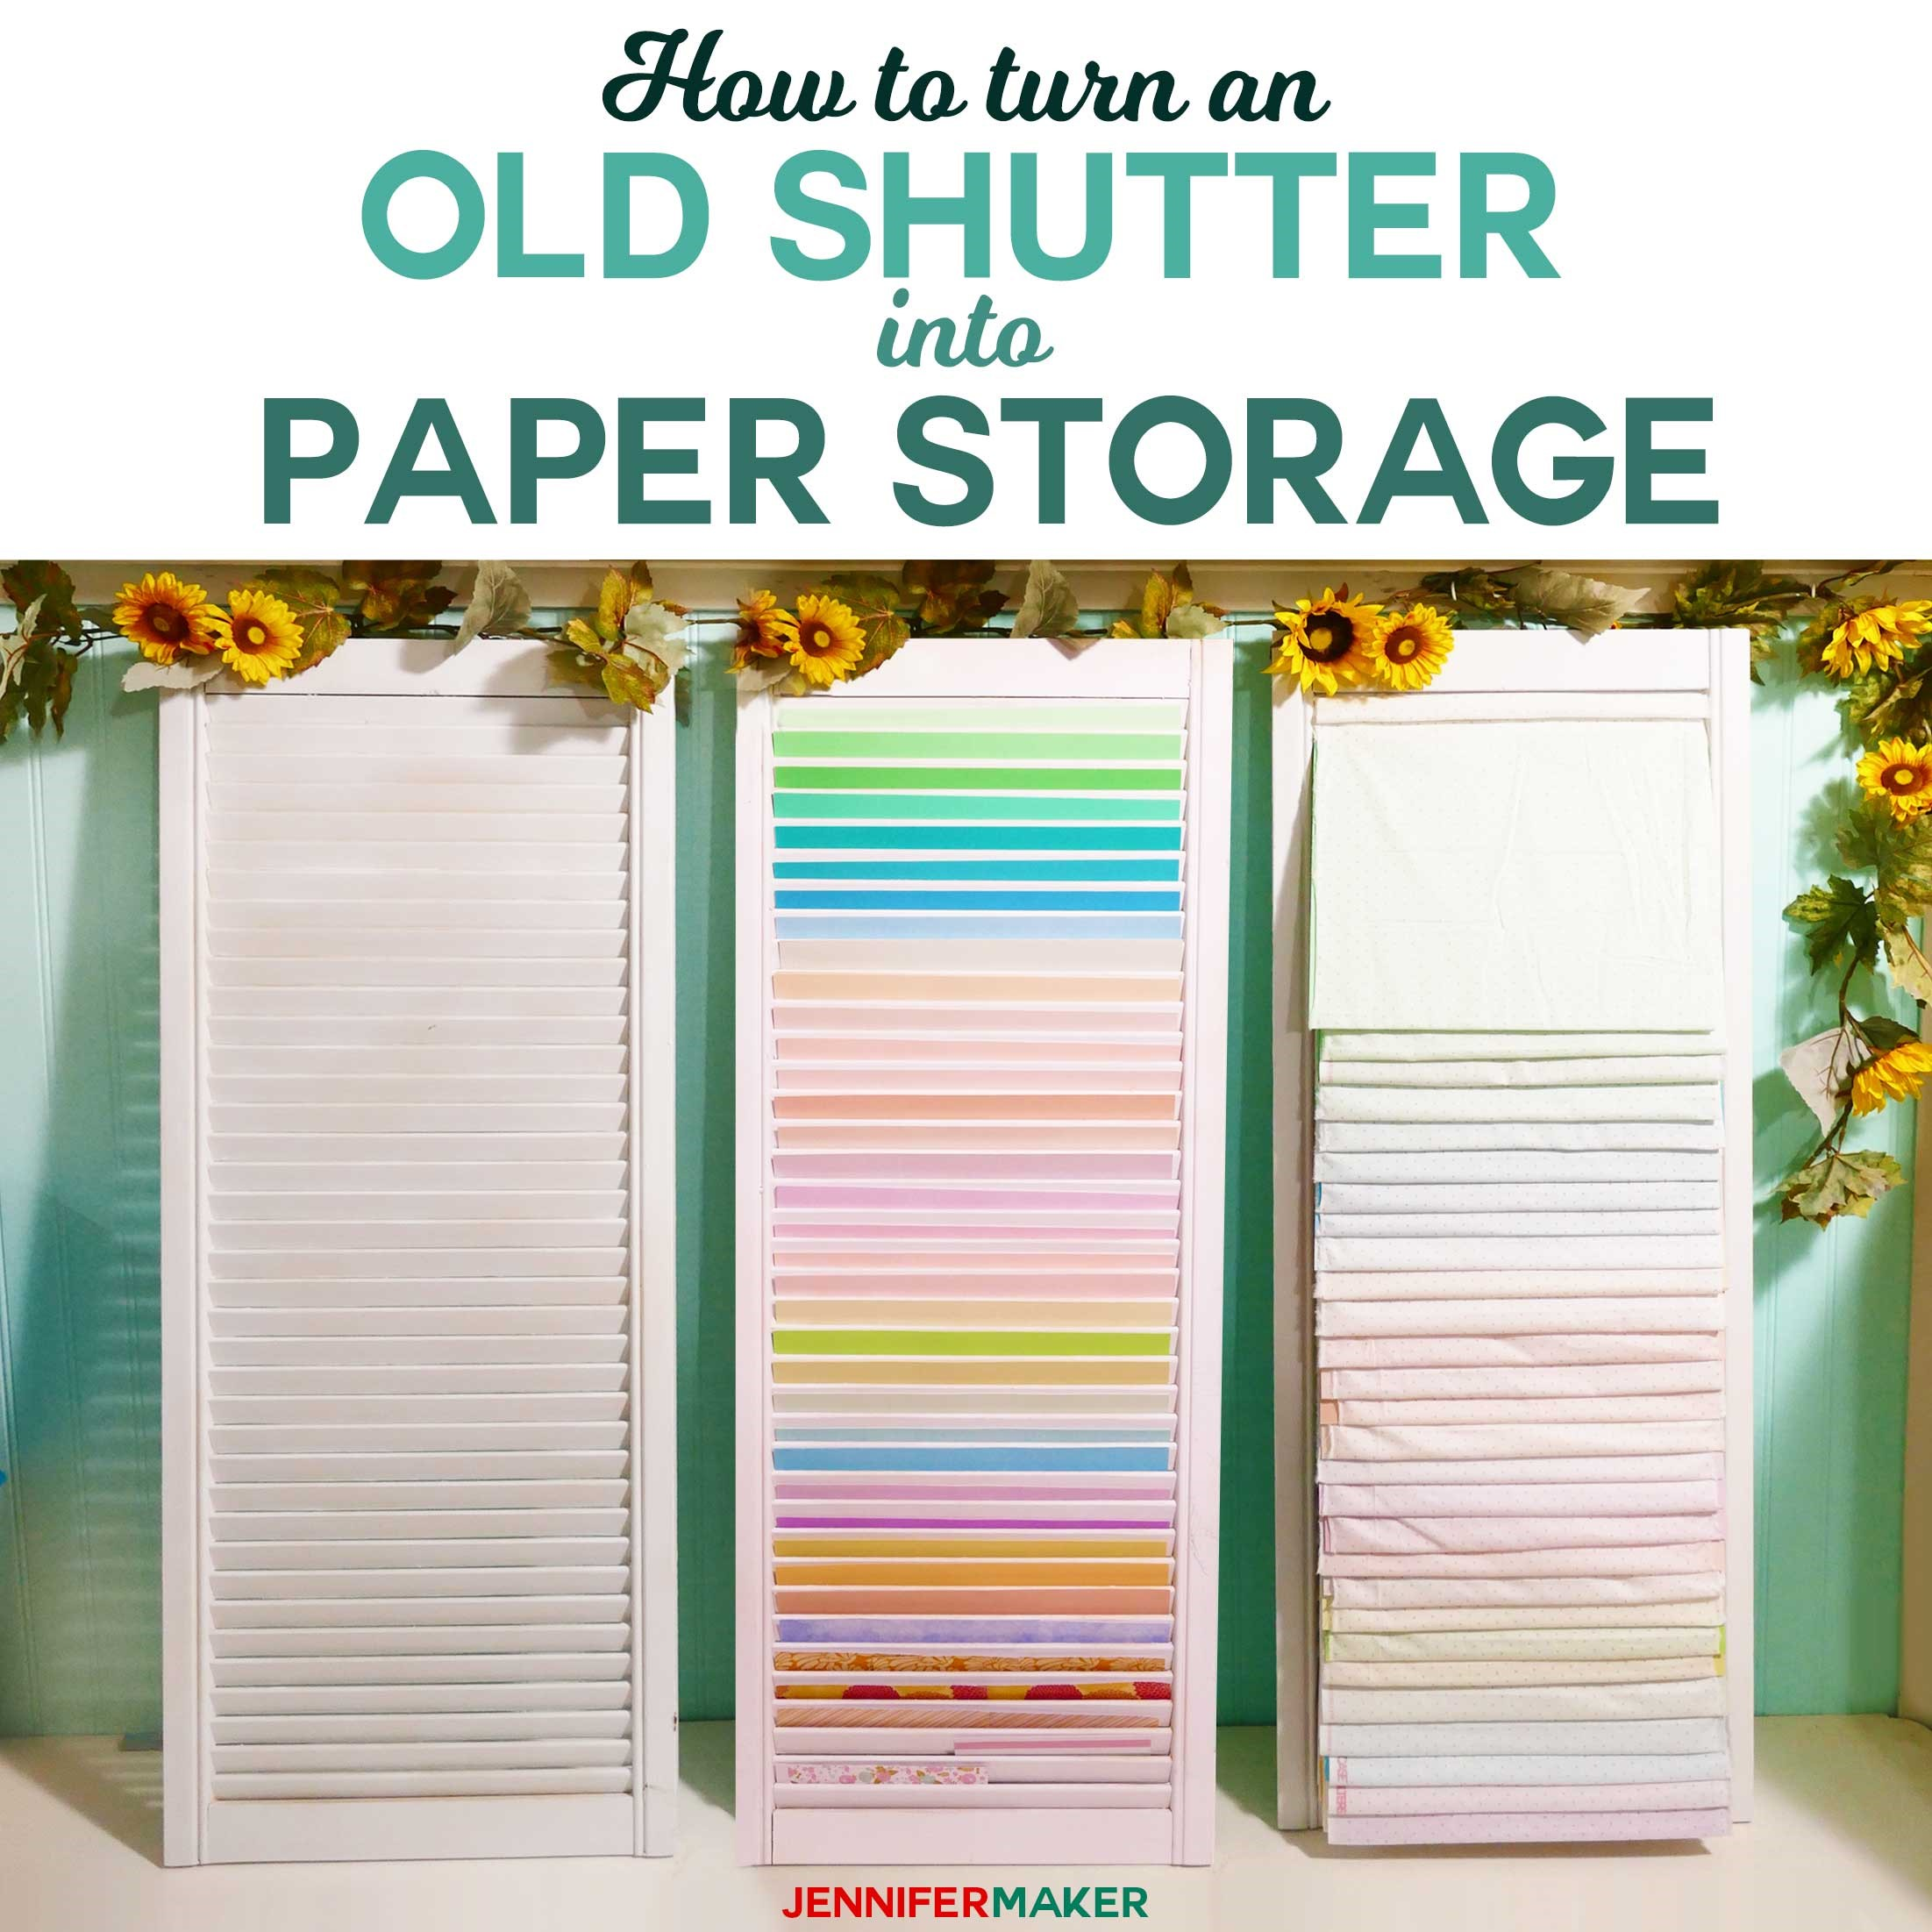 8. Paper Storage via Simphome